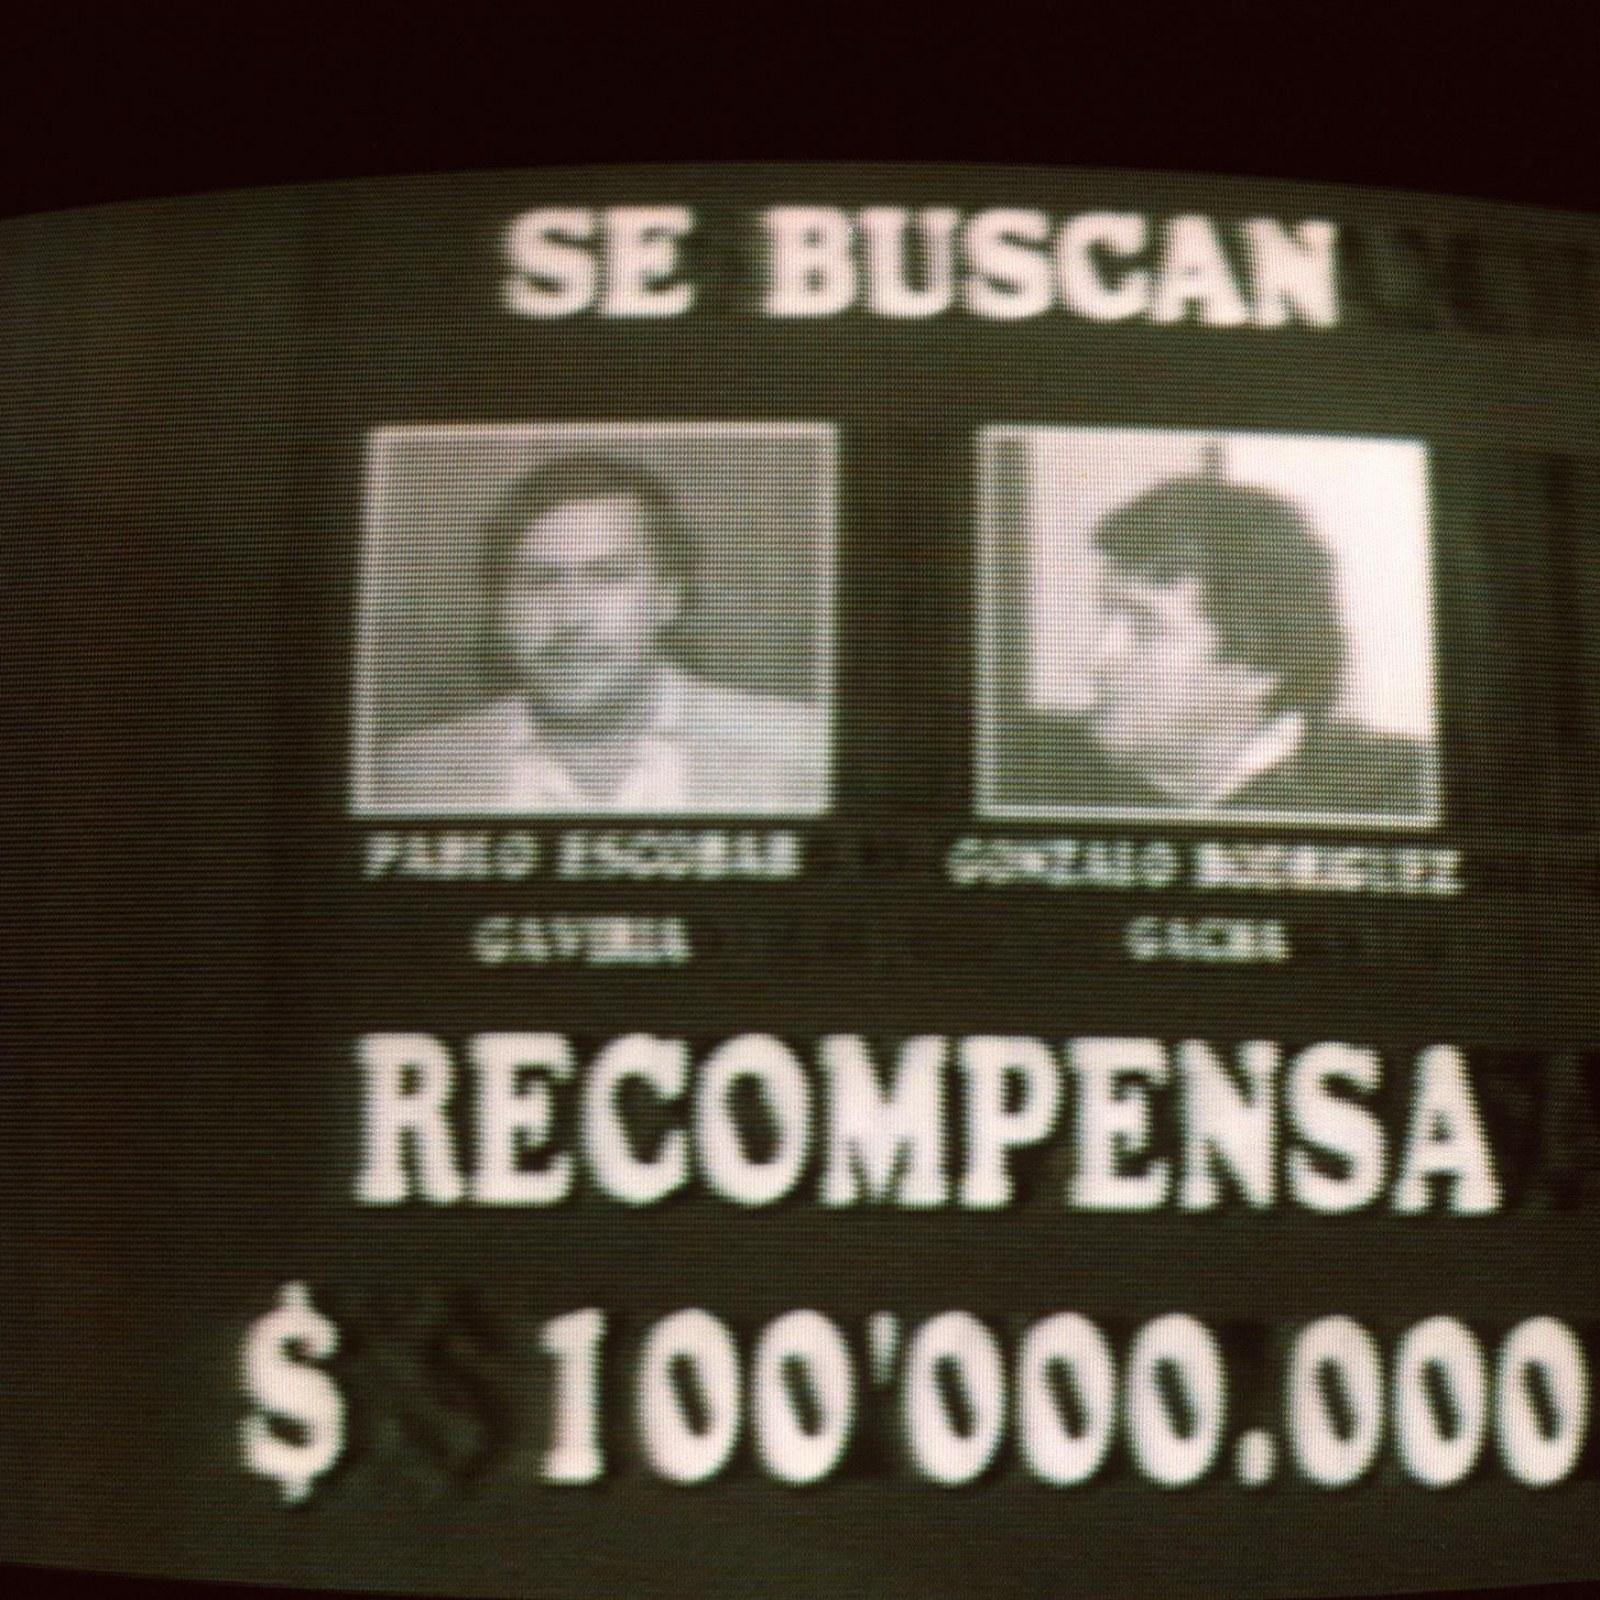 Pablo Escobar Vs  El Chapo Net Worth: Which Brutal Drug Lord